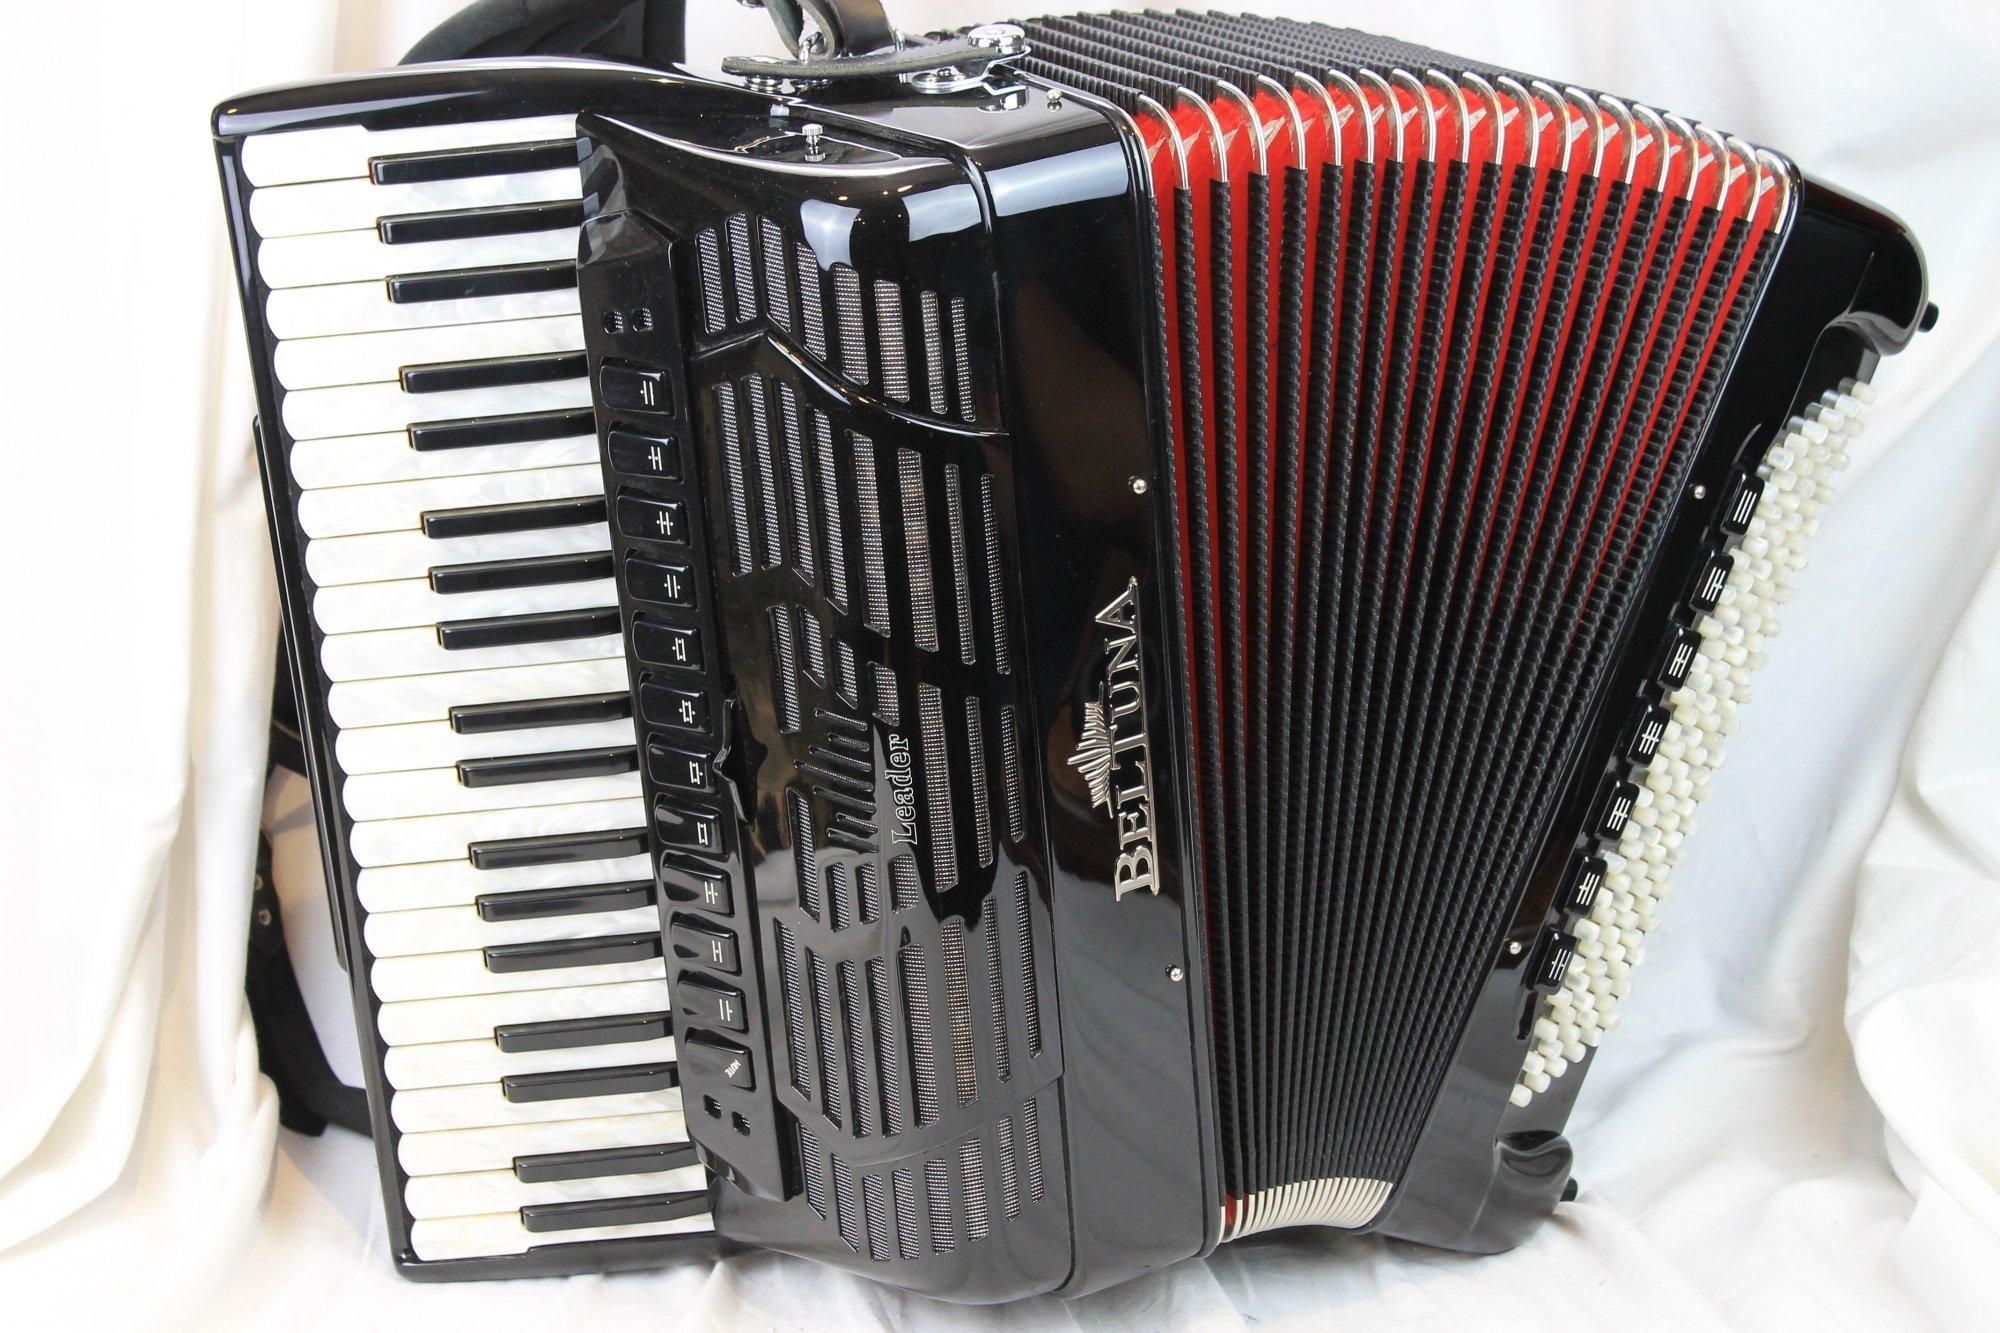 NEW Black Beltuna Leader IV Piano Accordion Slender LMMH 41 120